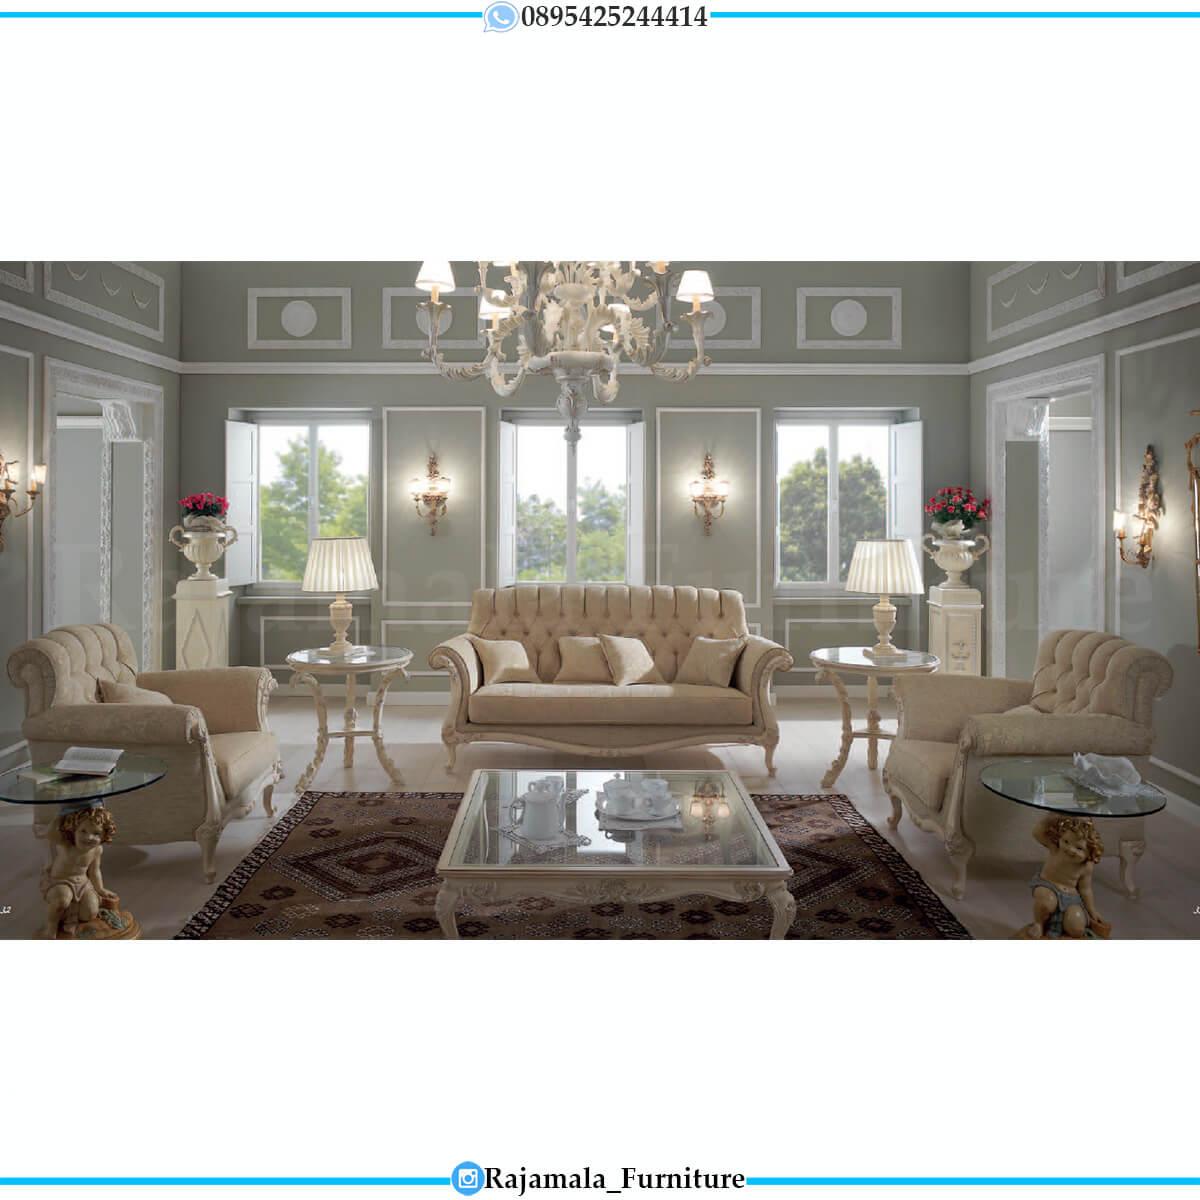 Set Sofa Tamu Mewah Jepara High Quality Best Price RM-0748